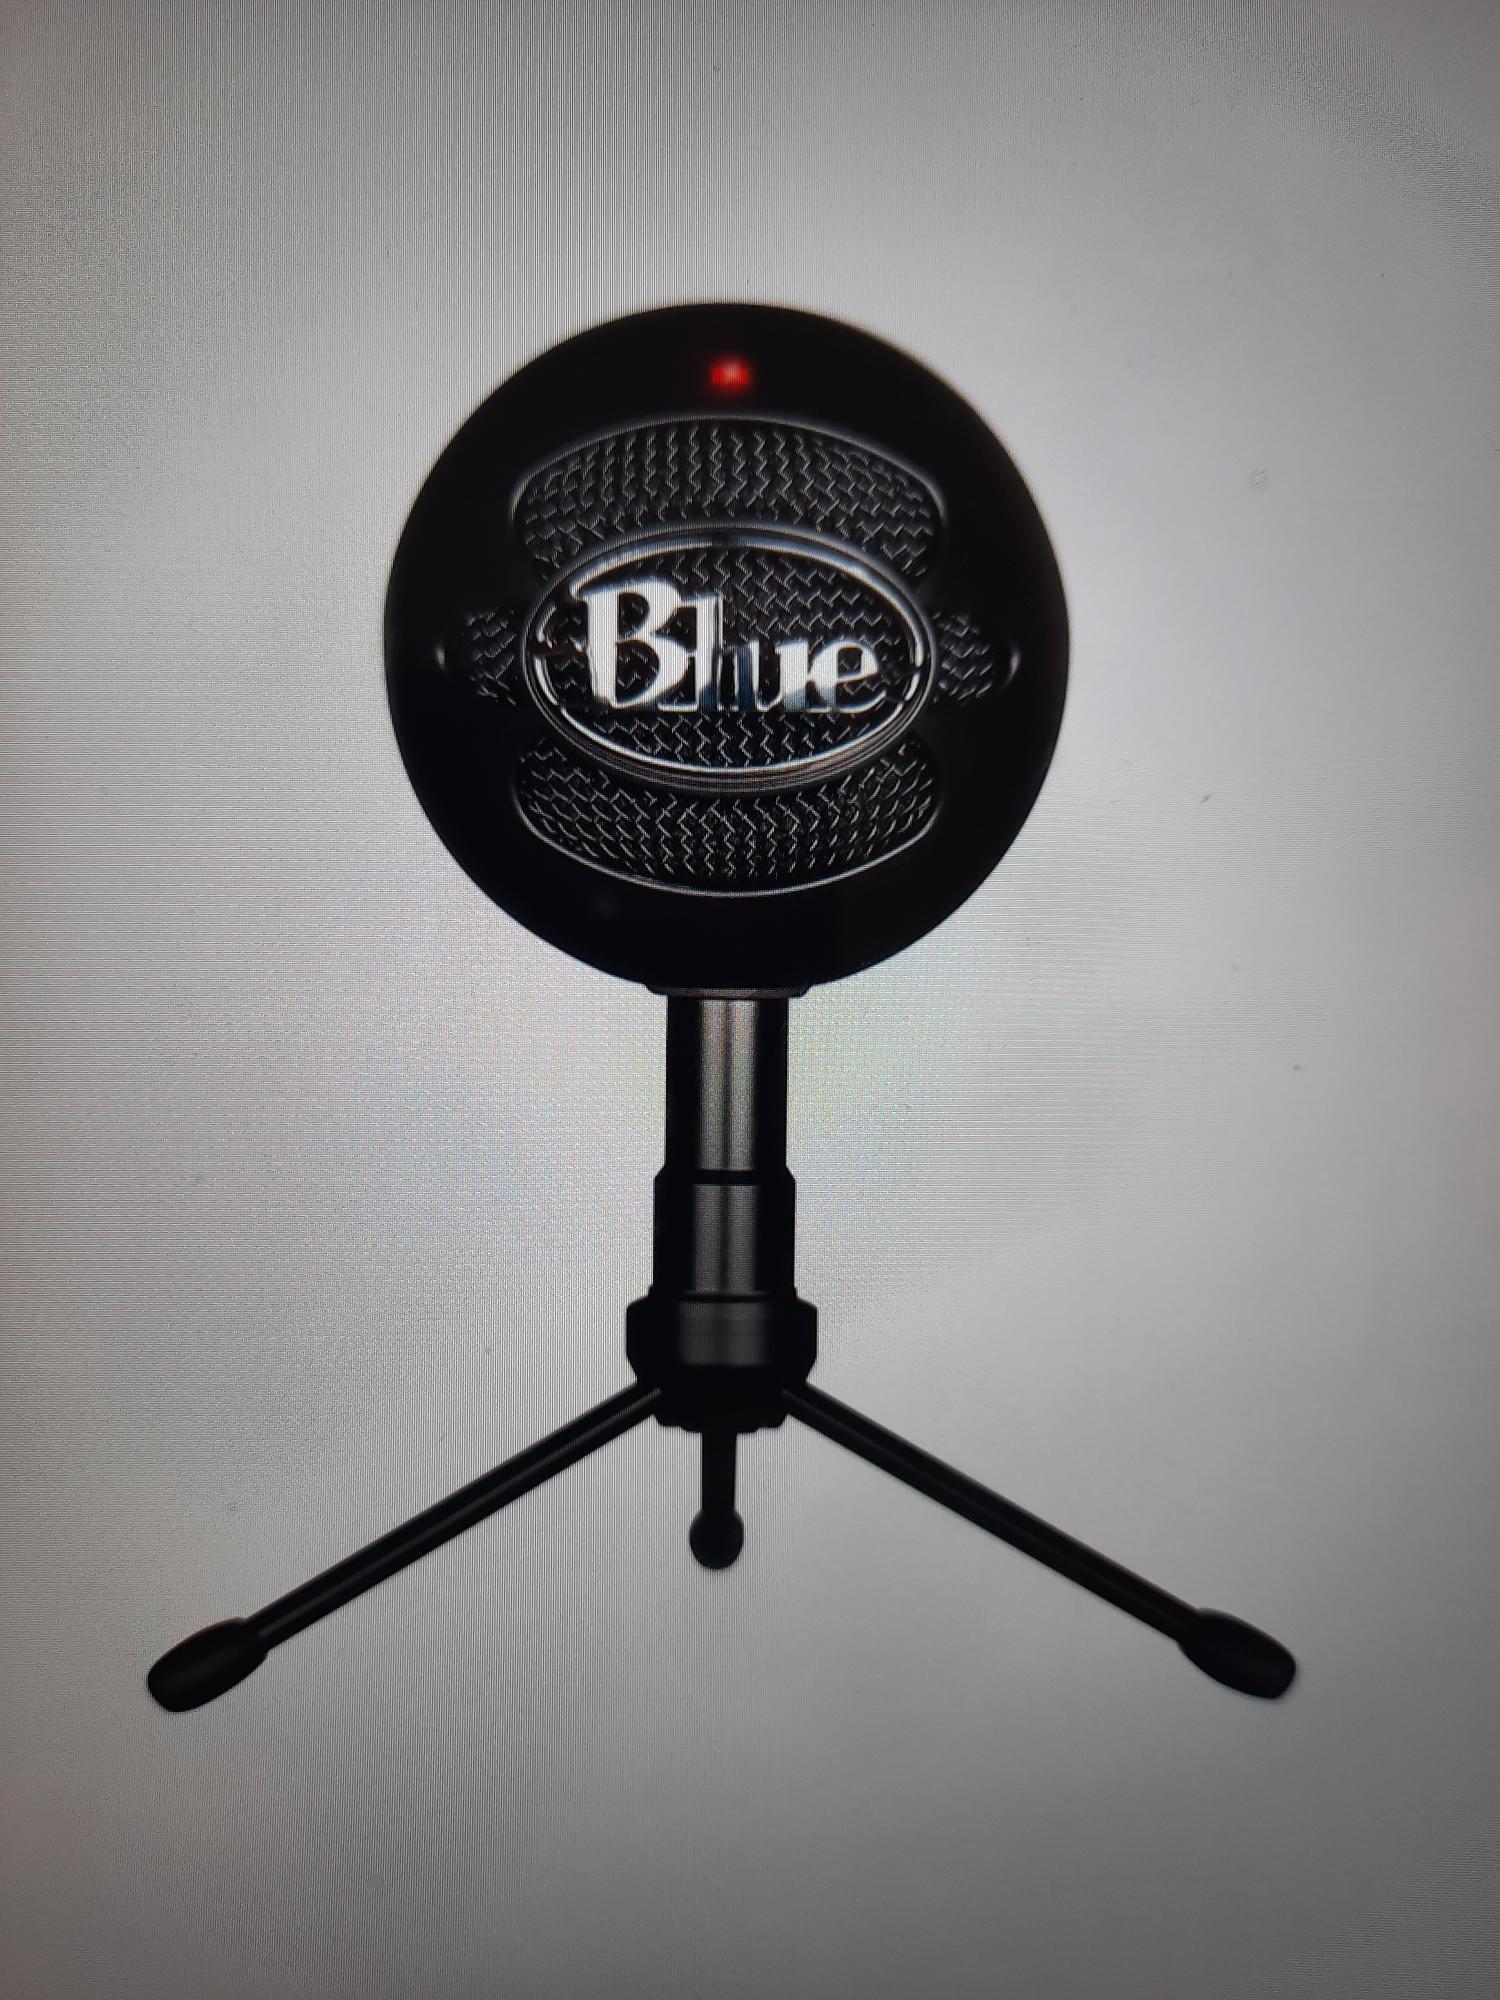 Blue Yeti Mikrofon (Inkl. Morgan Stativ) | FINN.no